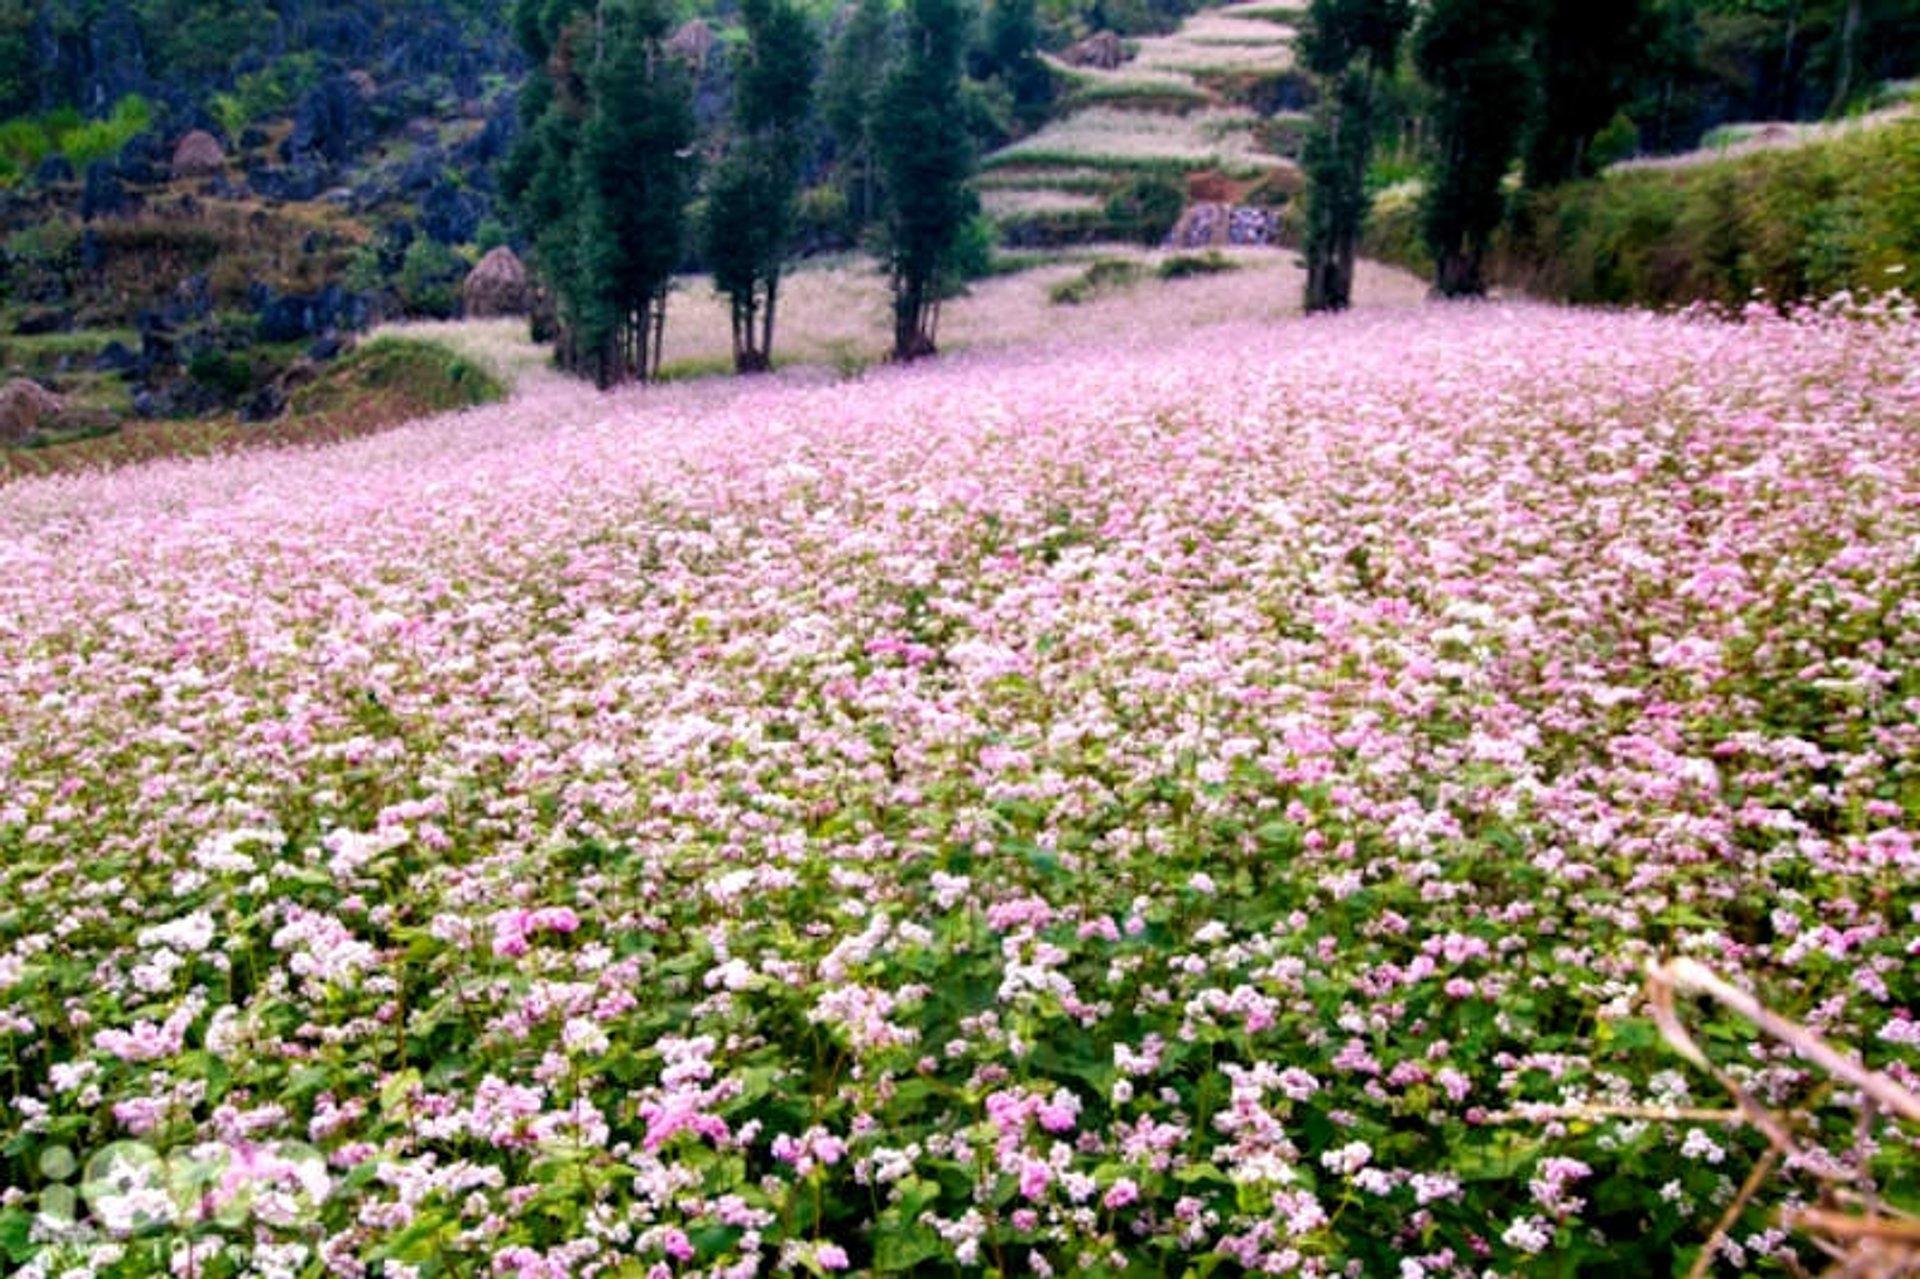 Buckwheat Bloom Season in Vietnam - Best Time